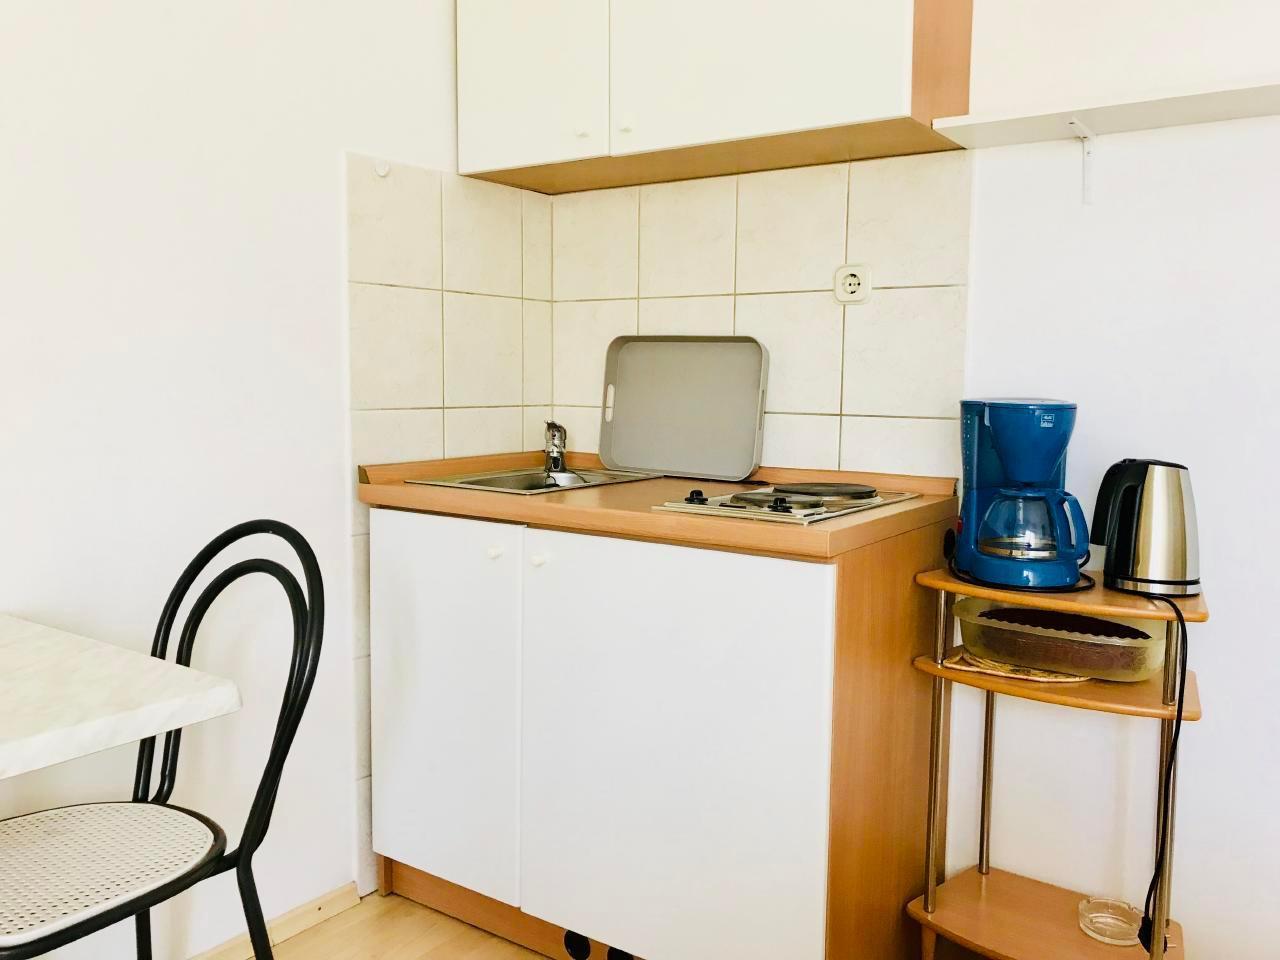 Ferienwohnung Apartmenthaus Ruza 6 - Apartment (98382), Kaštel Štafilić, , Dalmatien, Kroatien, Bild 8